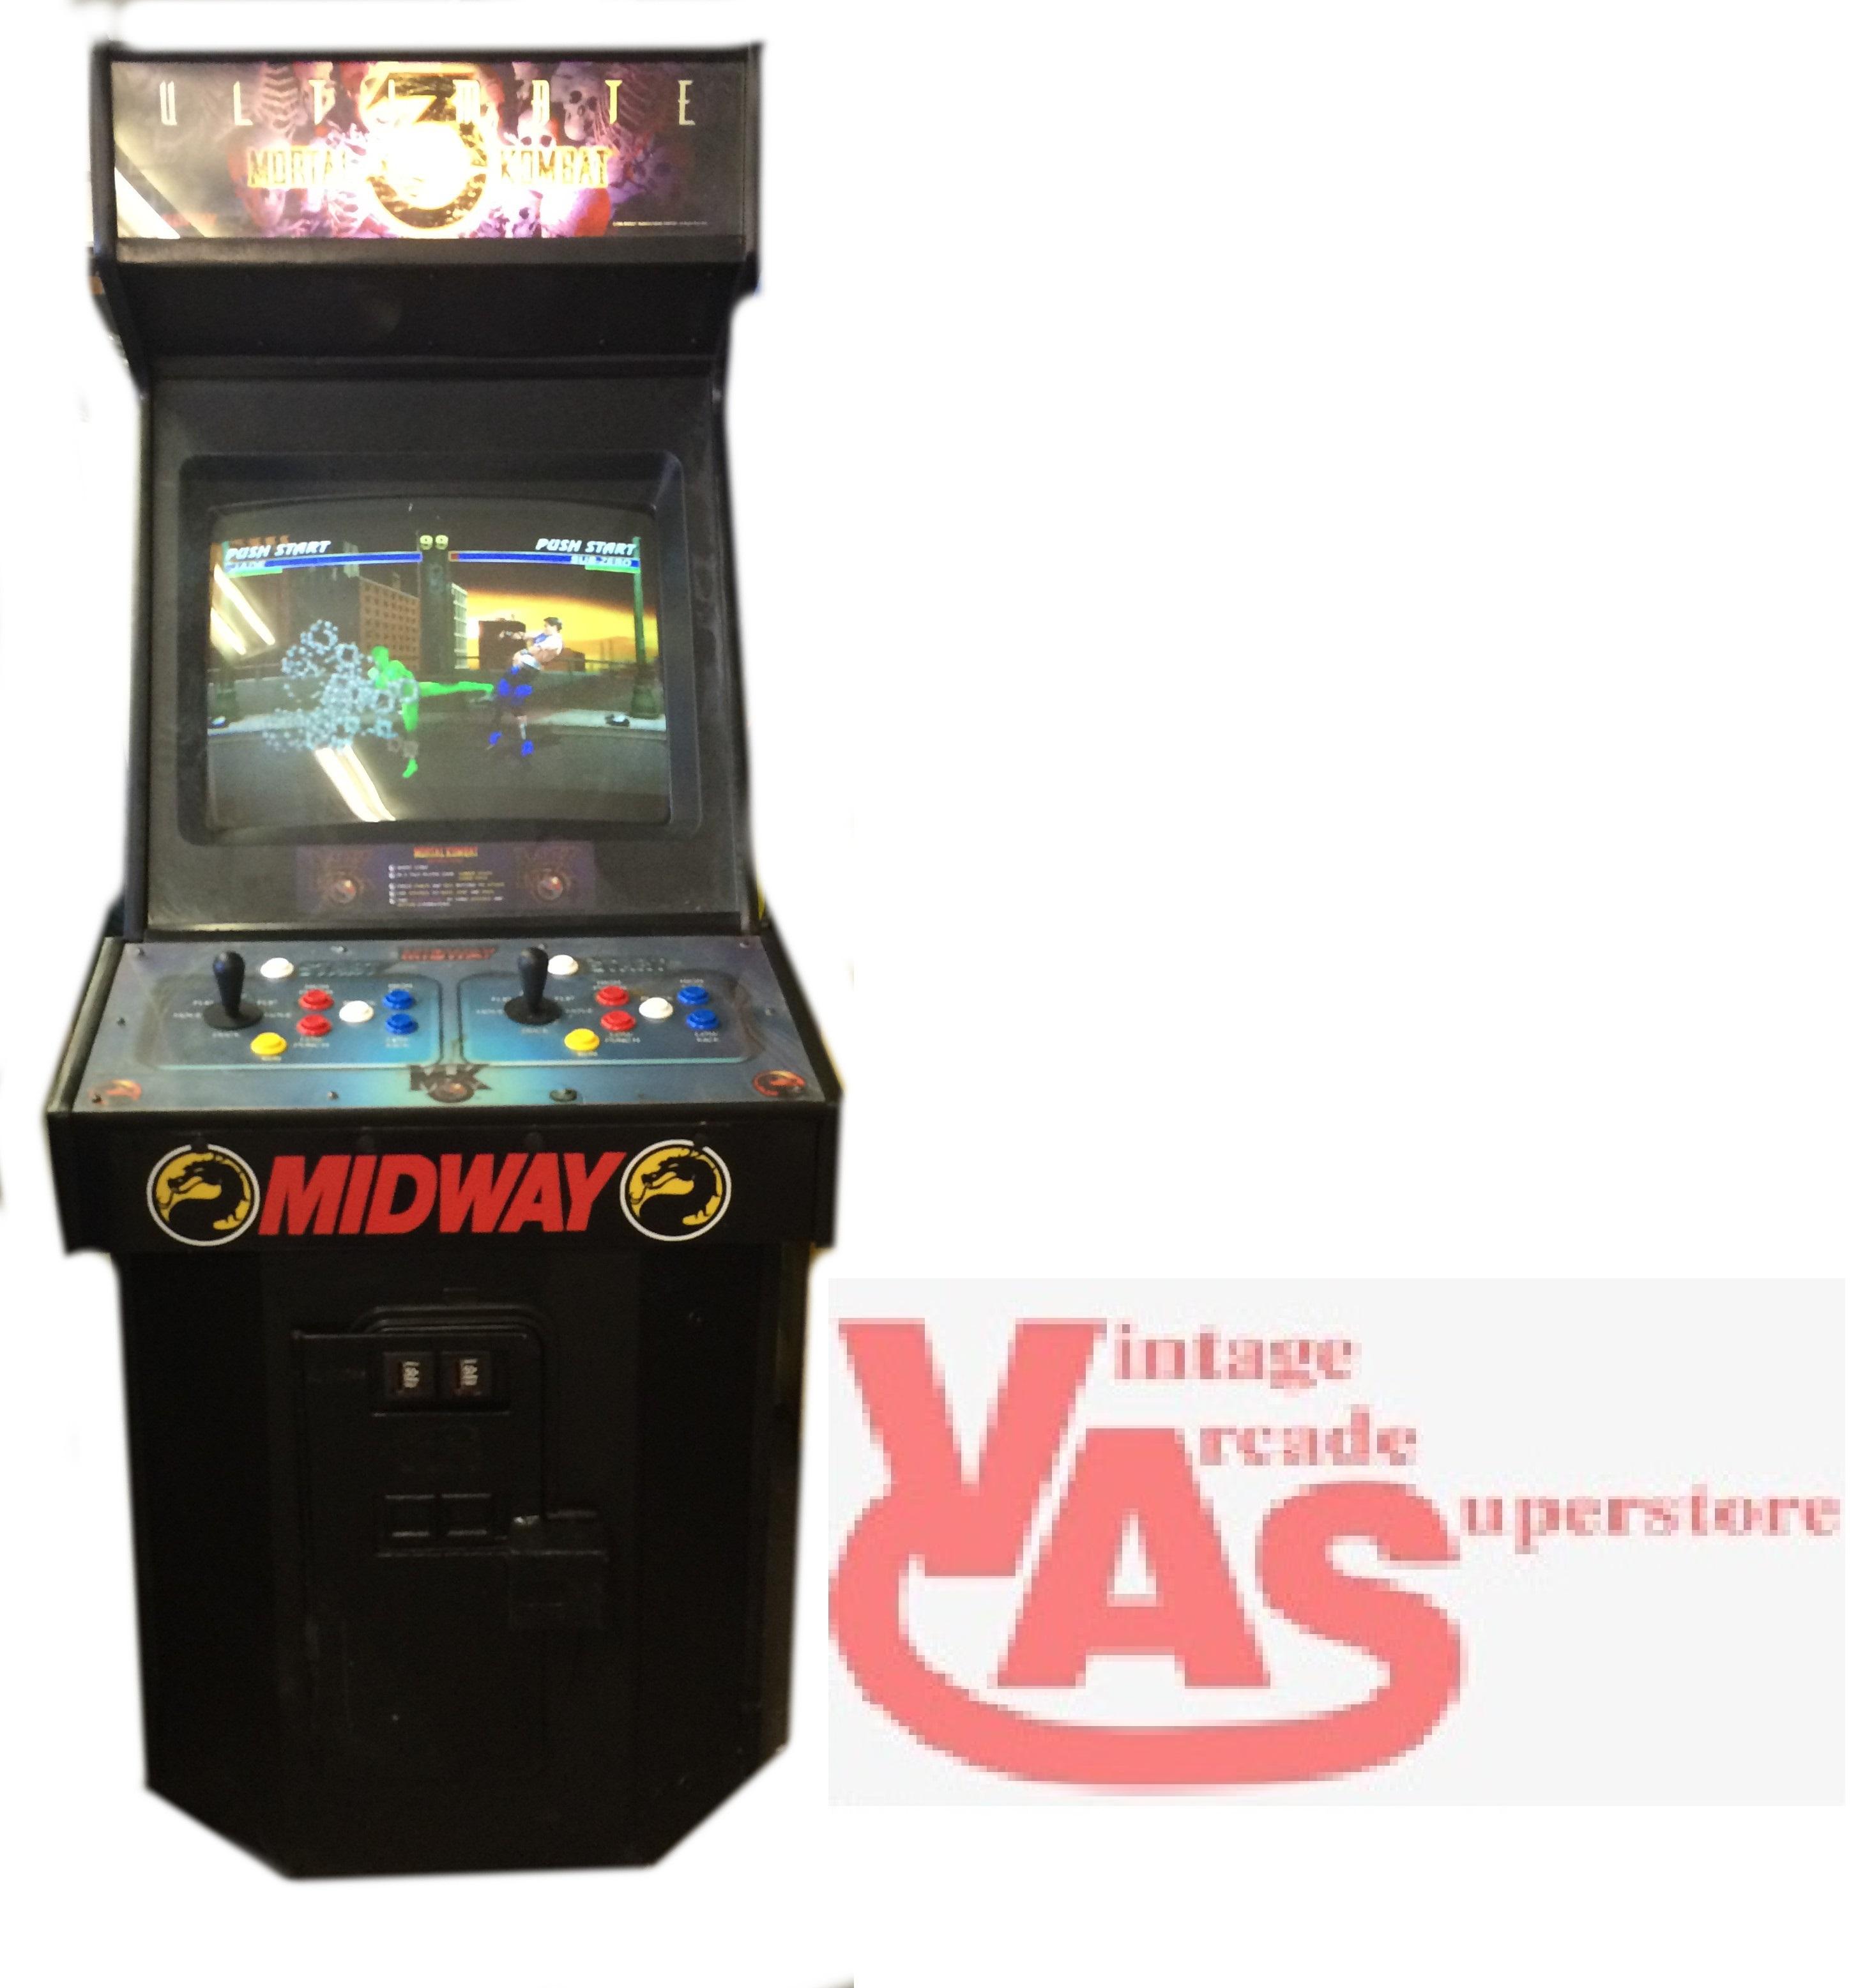 mortal kombat 3 ultimate arcade game for sale